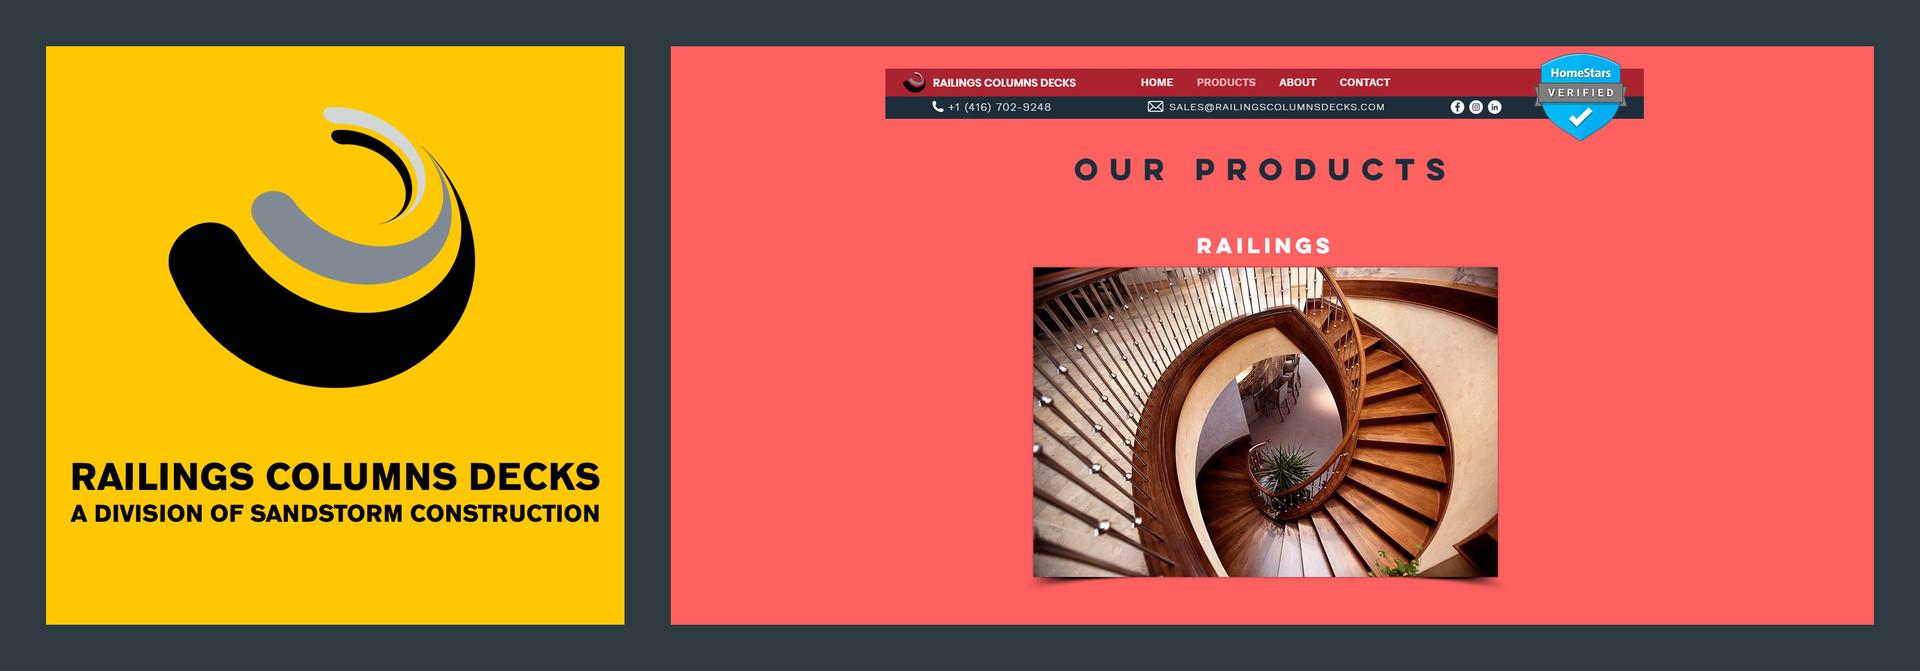 railings-columns-decks-responsive-website-design